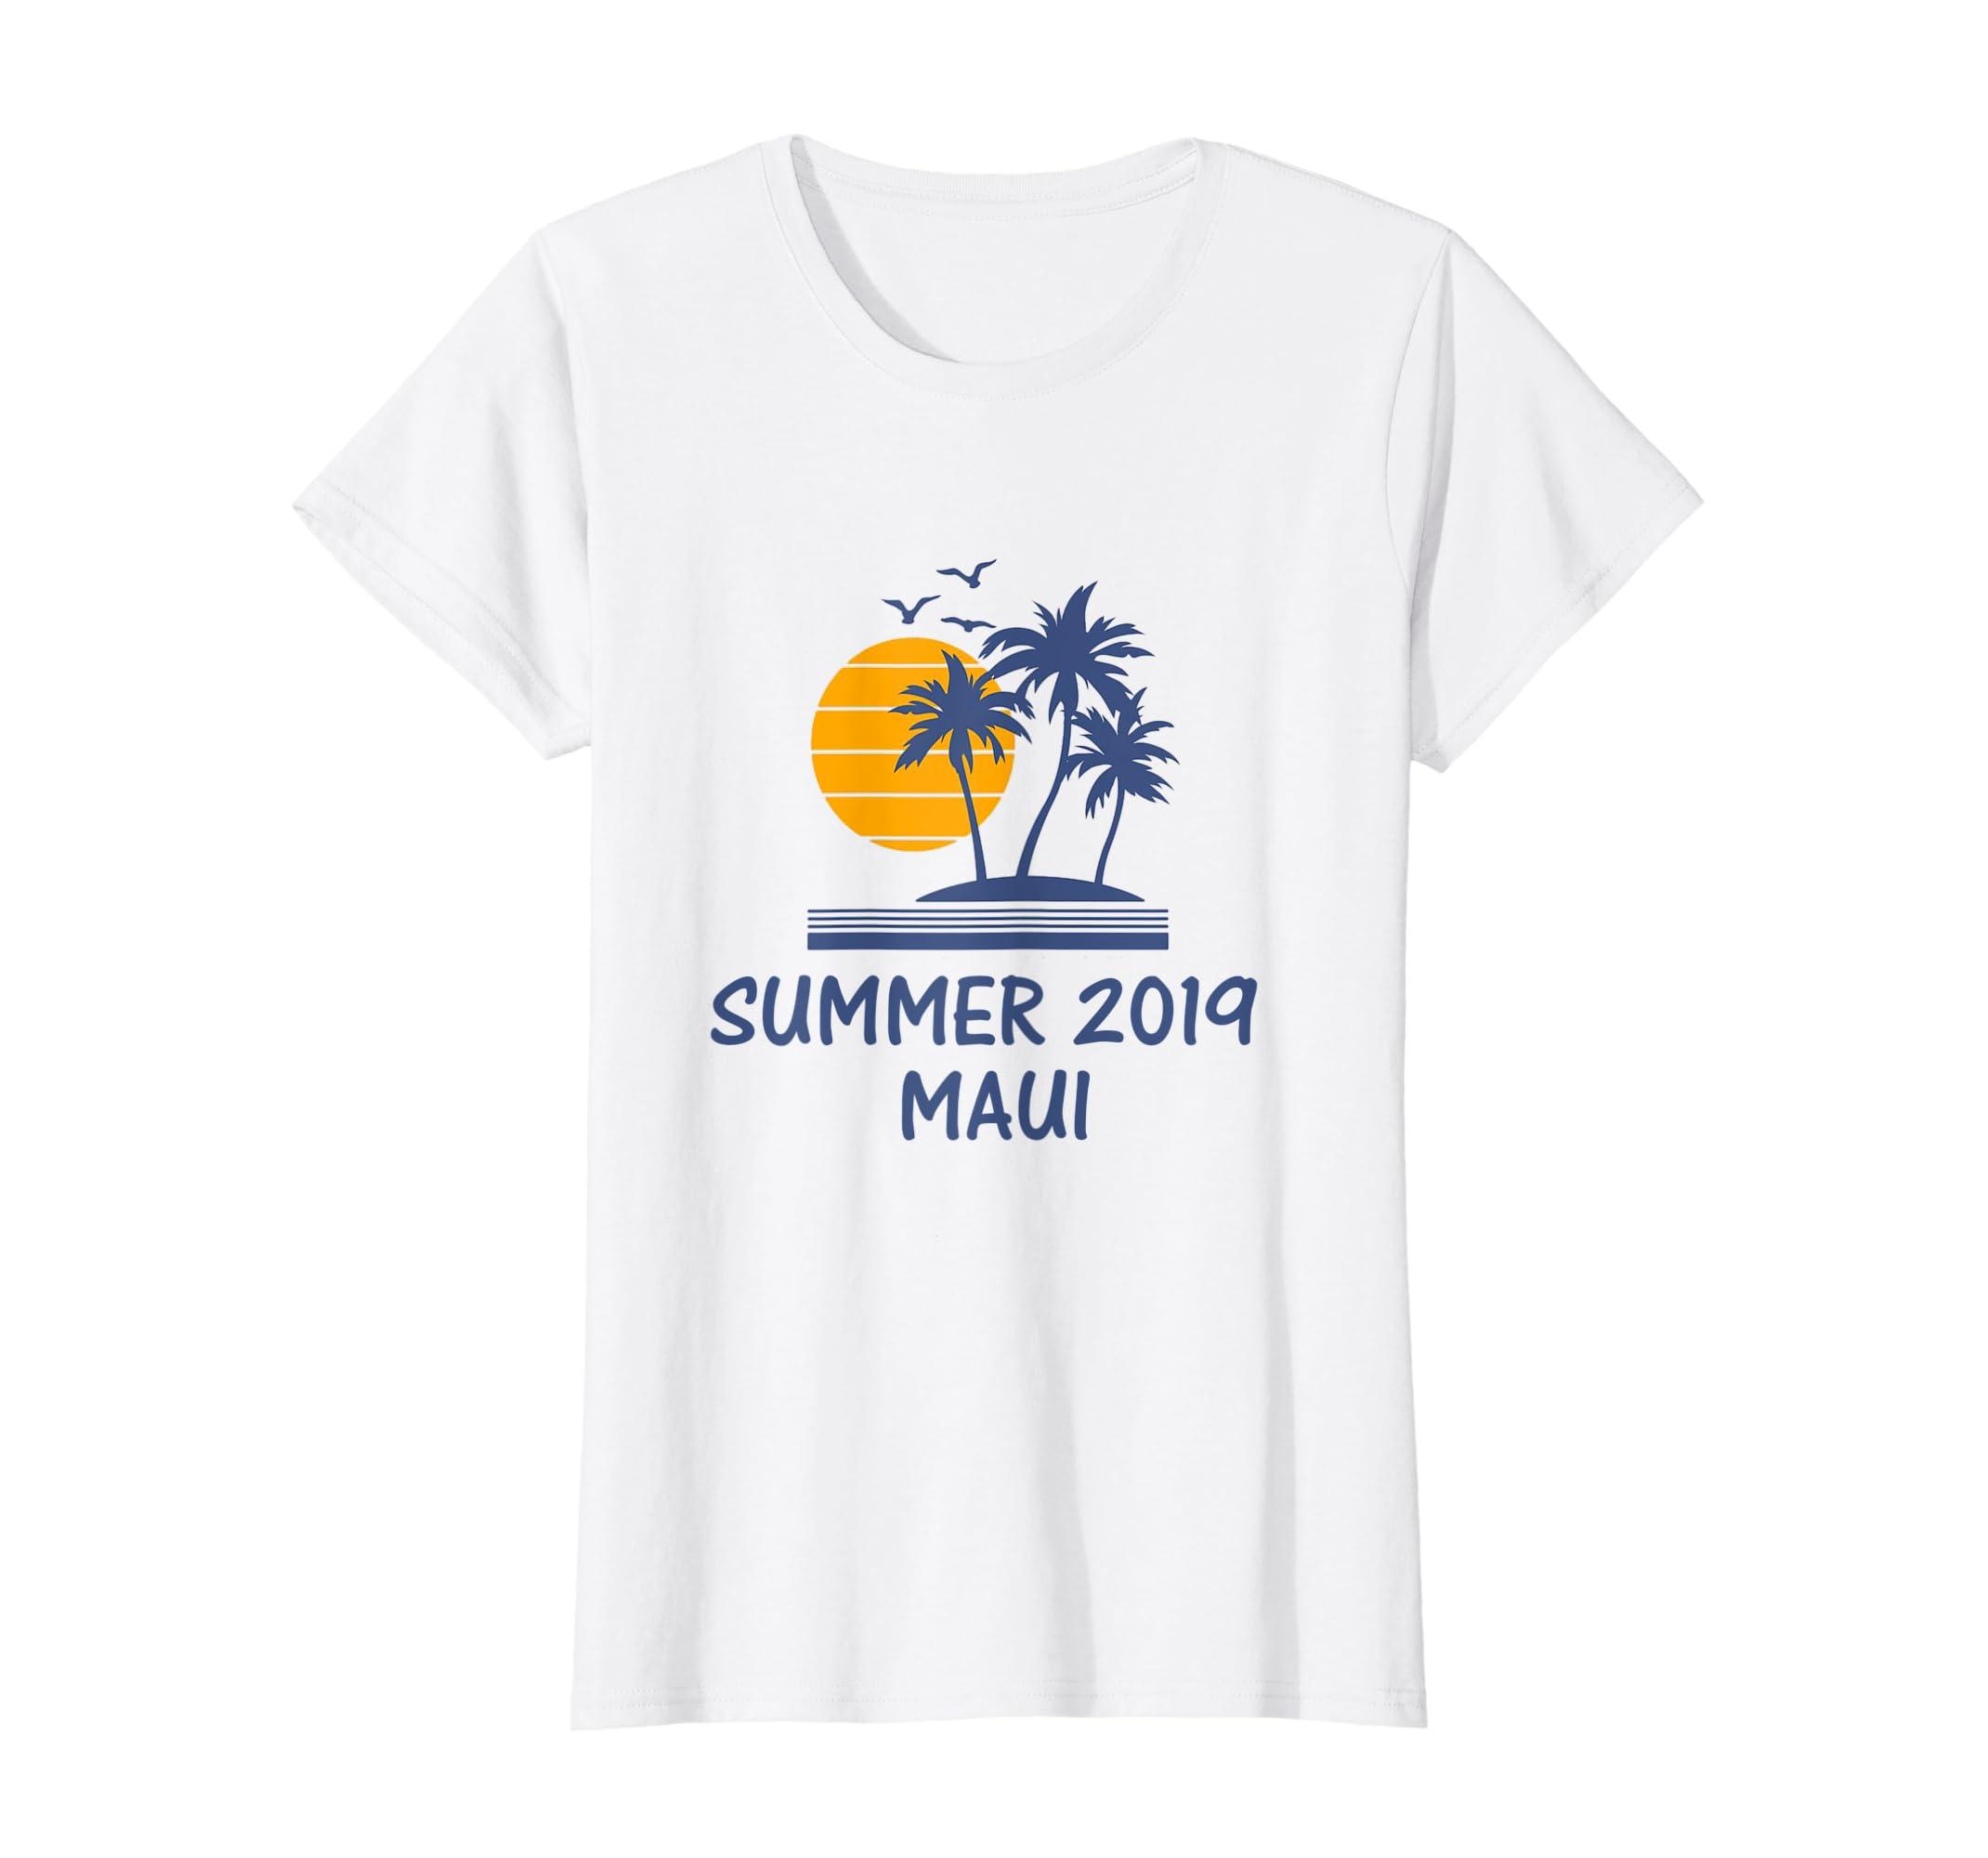 a530a65b45c Amazon.com  Summer Maui Hawaii HI Shirt Trip 2019 Beach Vacation Gift   Clothing